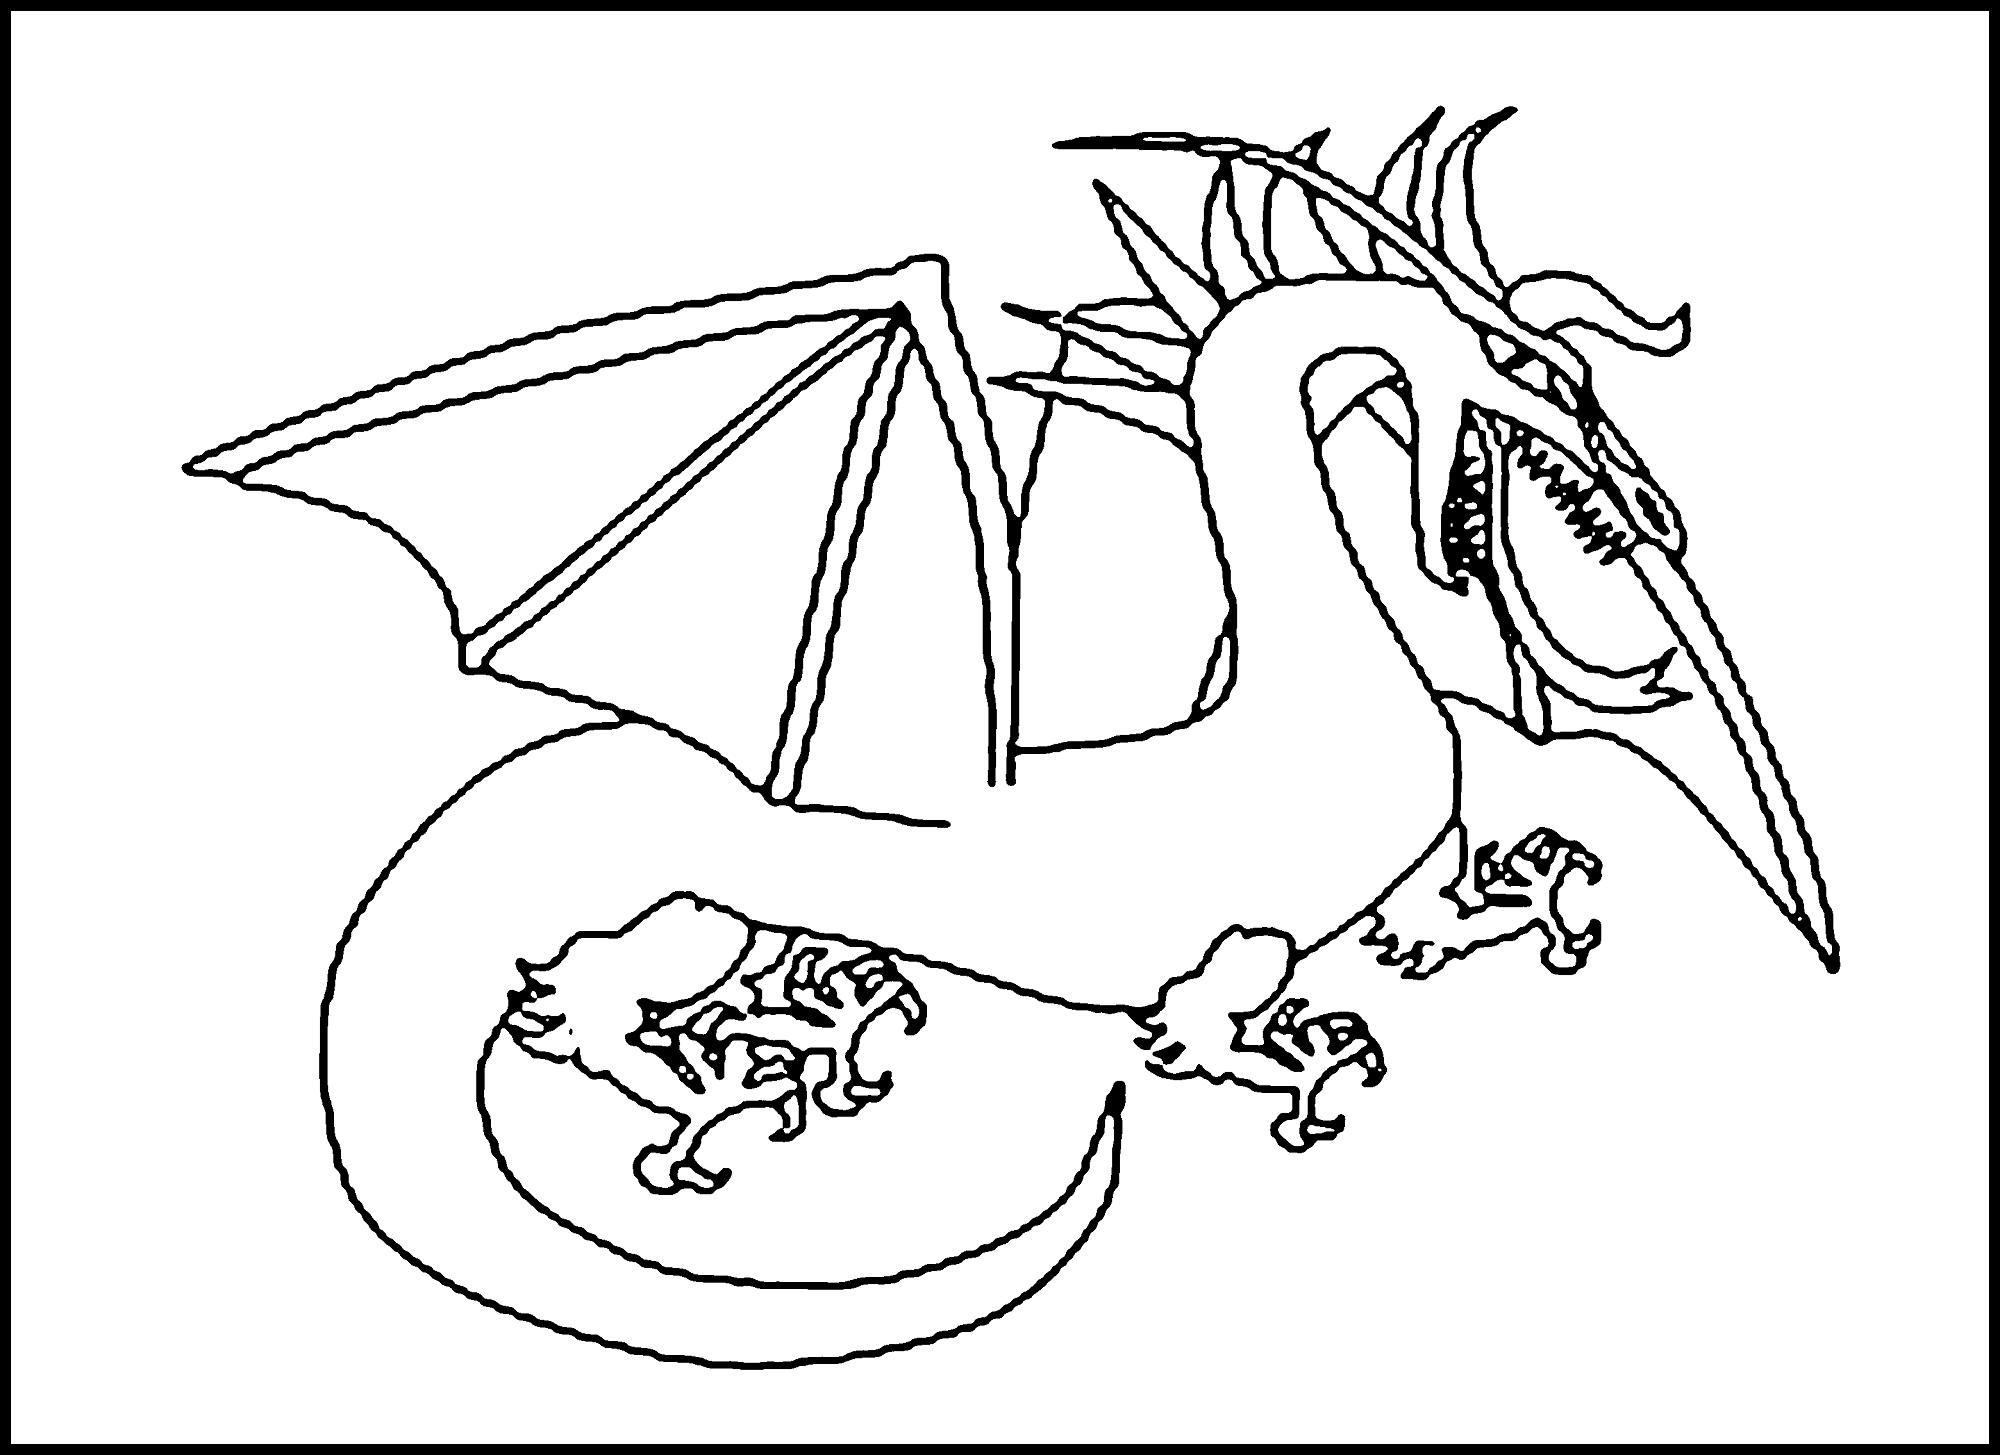 printable dragon pictures dragon coloring pages printable only coloring pages pictures dragon printable